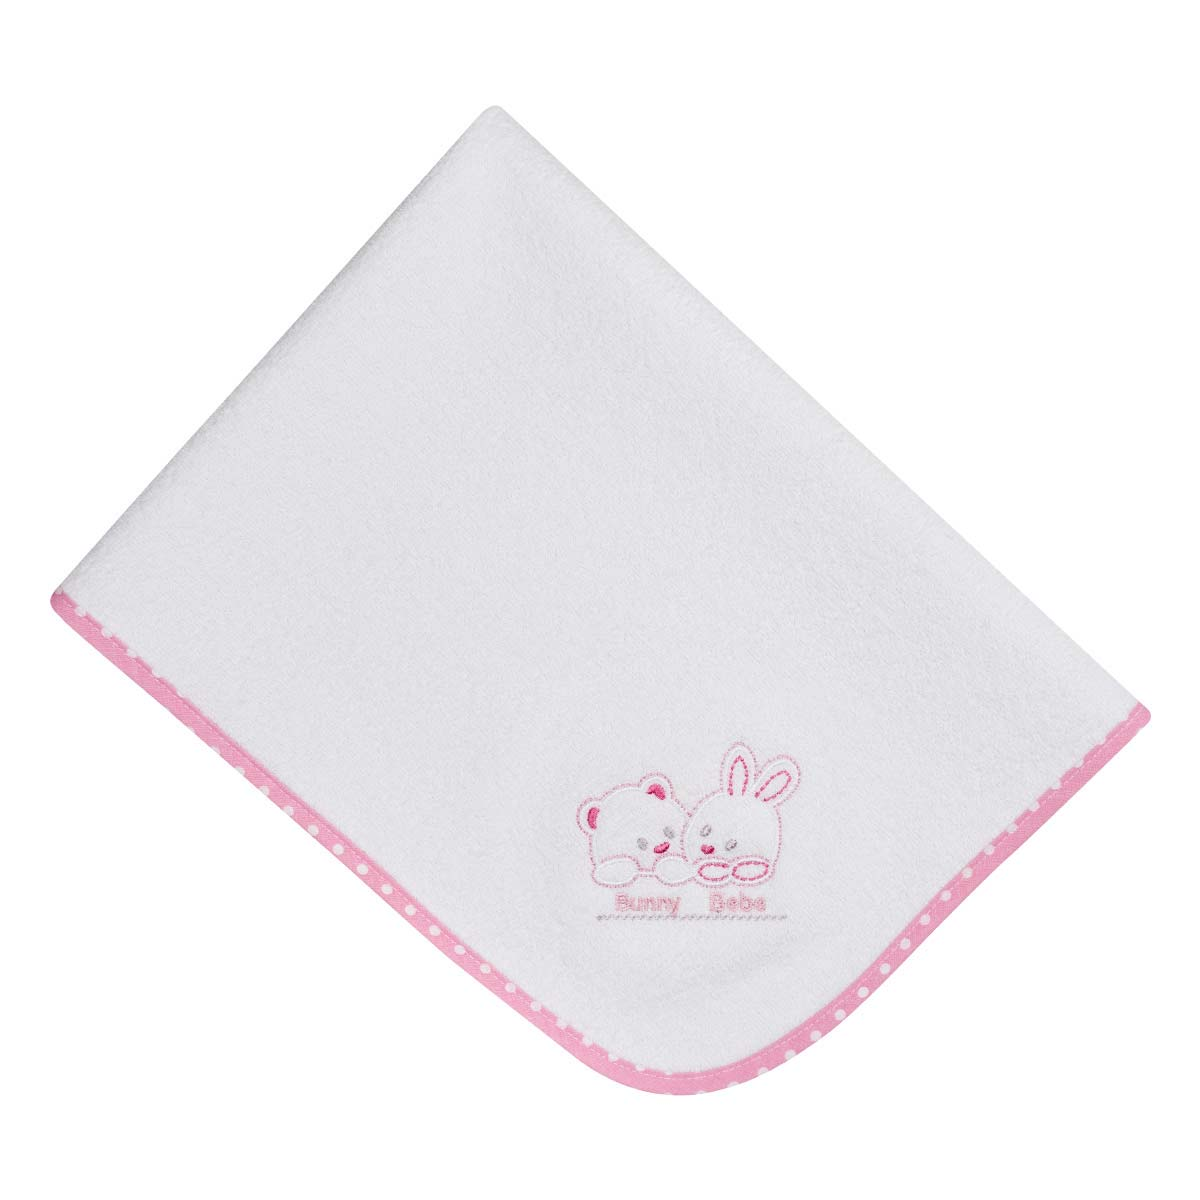 Bunny bebe σελτεδάκι 45×65 αρκουδάκια ροζ πουά